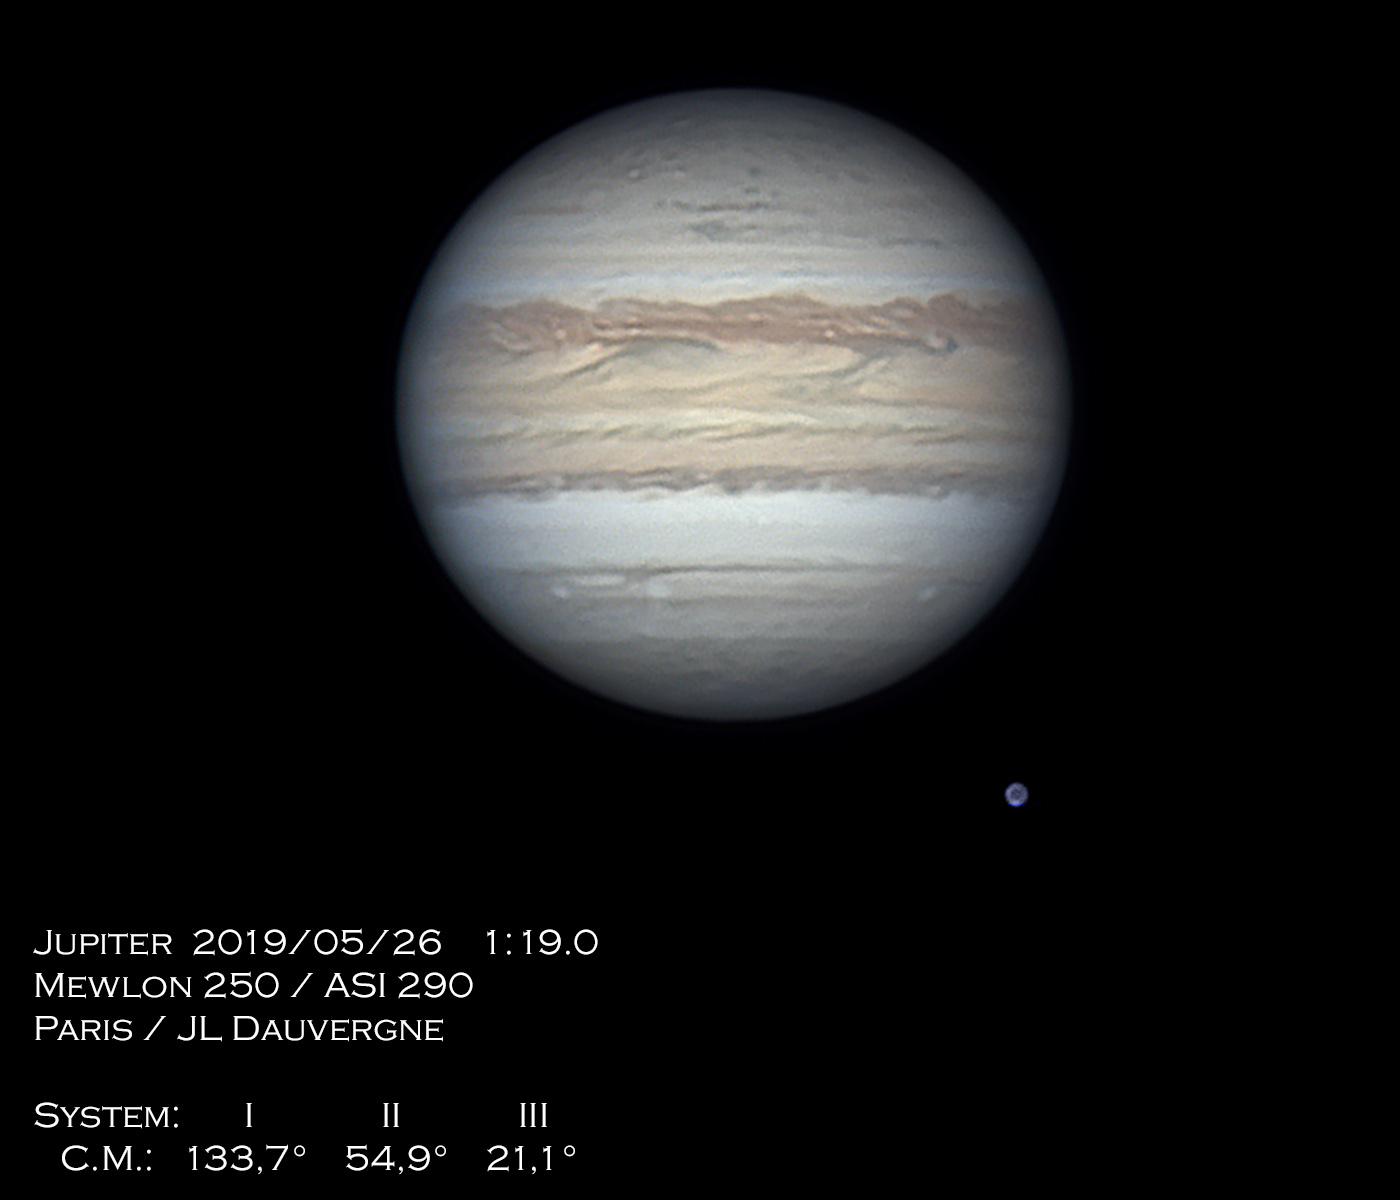 5ceafb4e4313f_2019-05-26-0119_0-G-Jupiter_ZWOASI290MMMini_lapl5_ap384.jpg.1e30f5b1b37615cfd5dfde3c4c2de65c.jpg